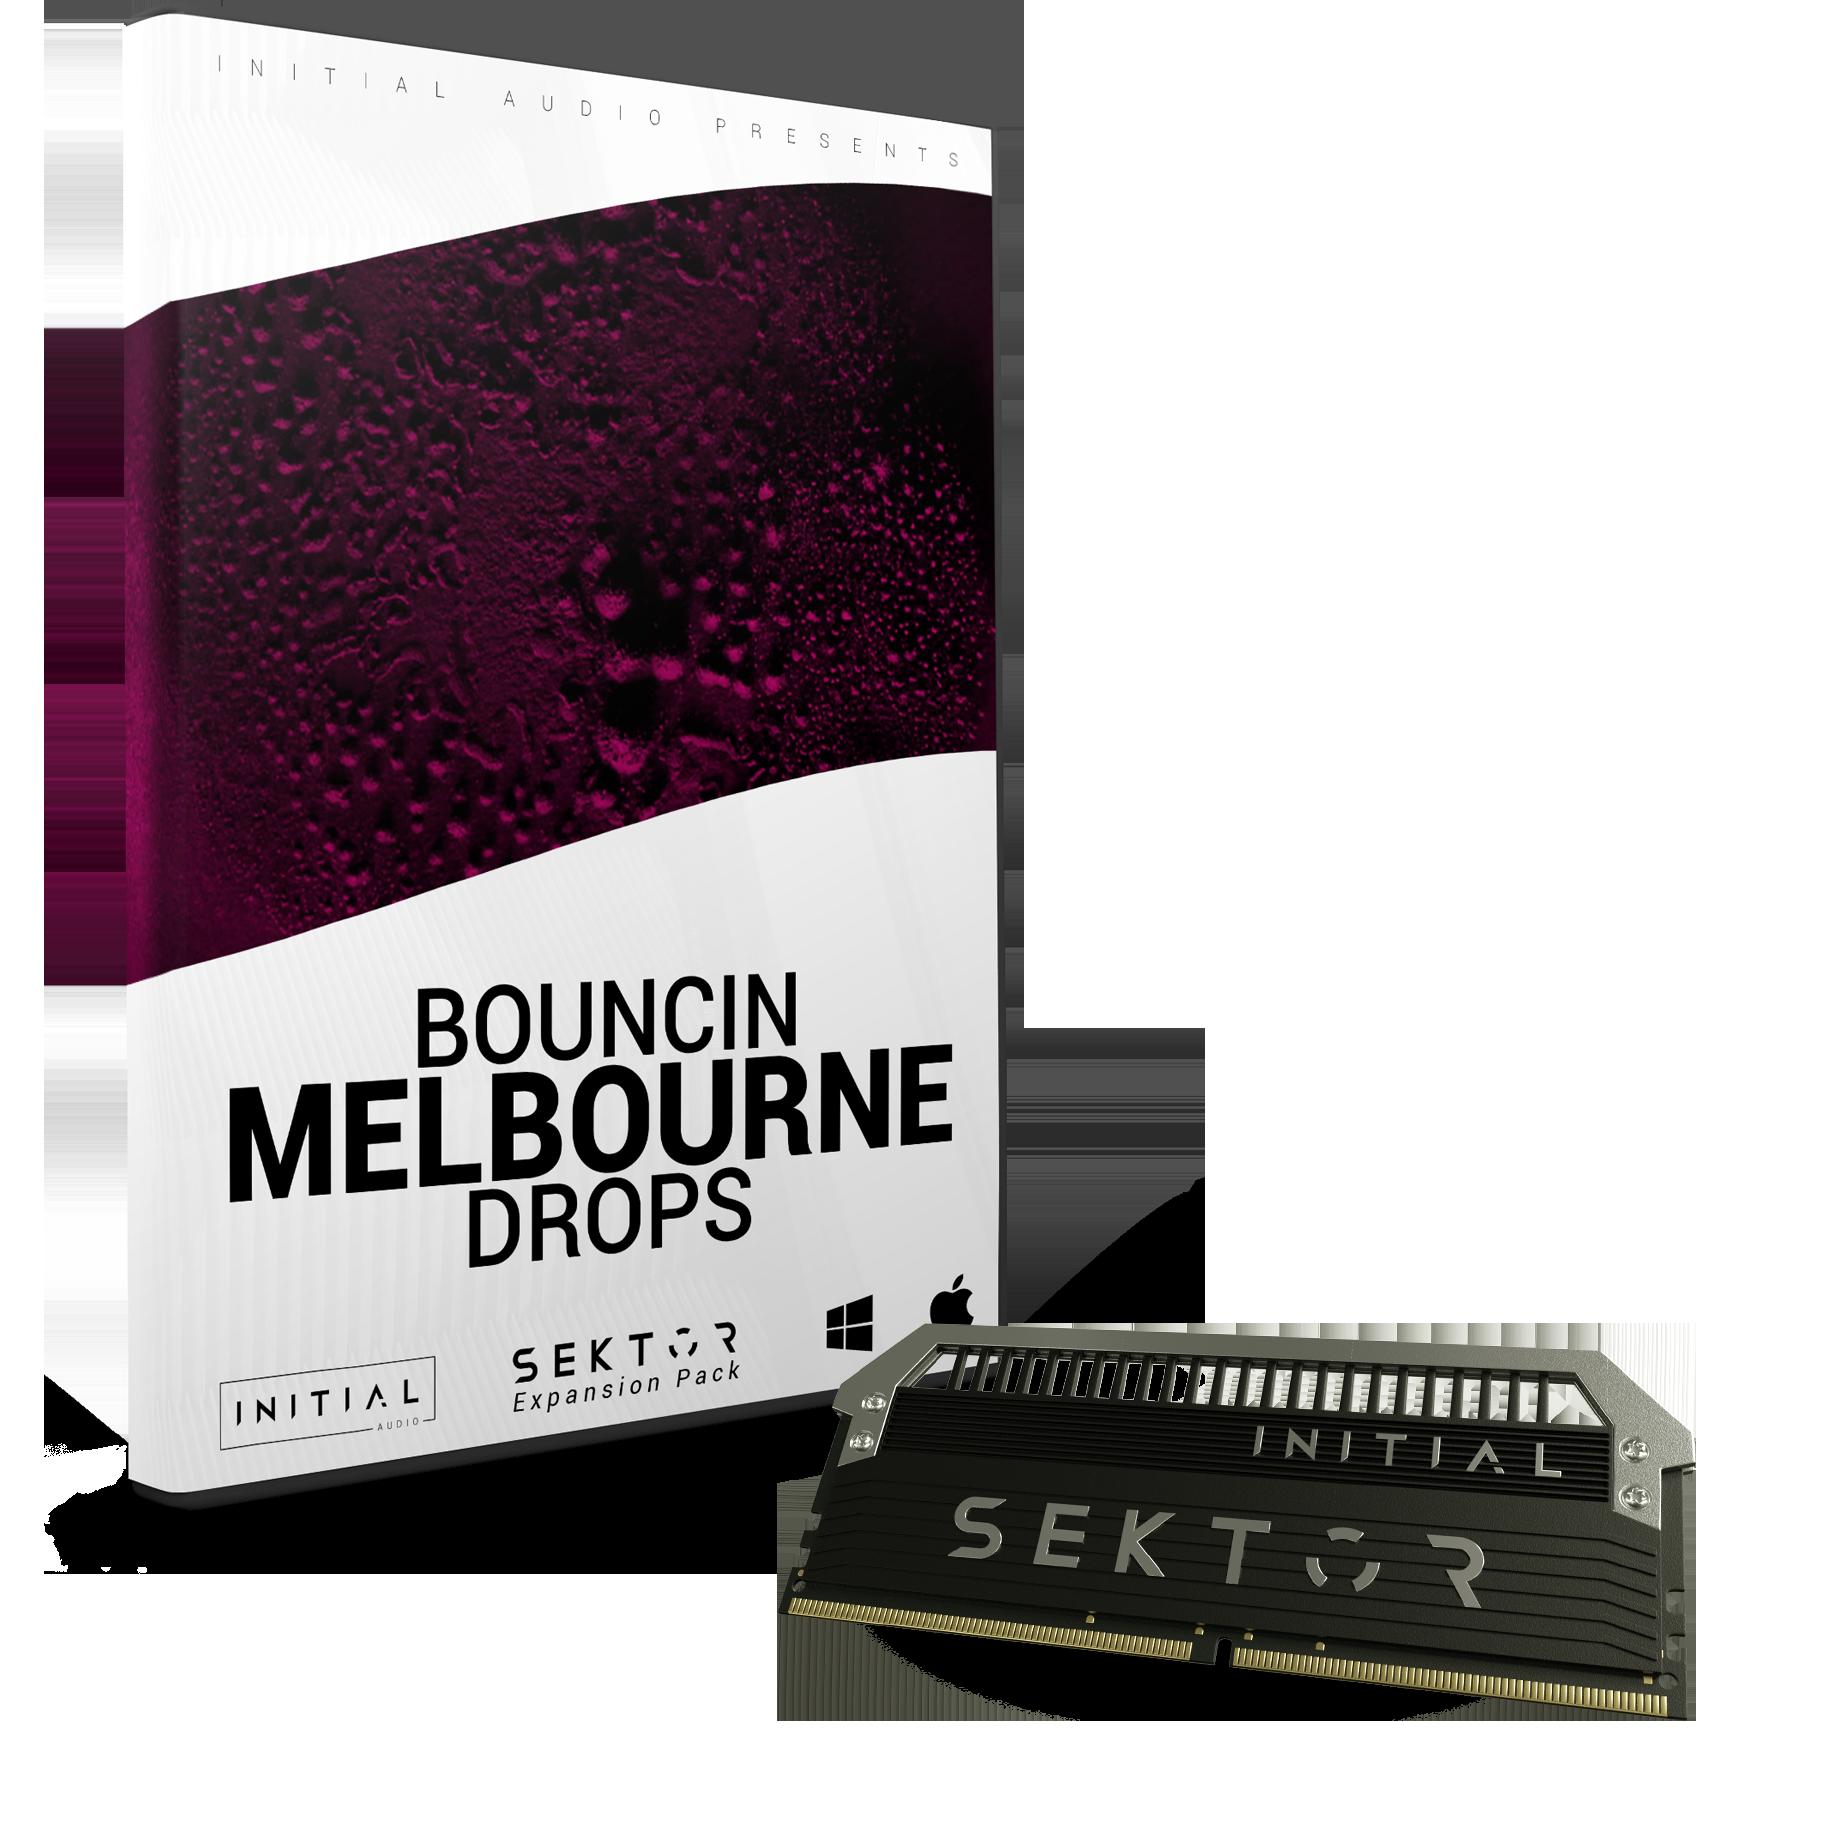 BOUNCIN MELBOURNE DROPS - SEKTOR XP